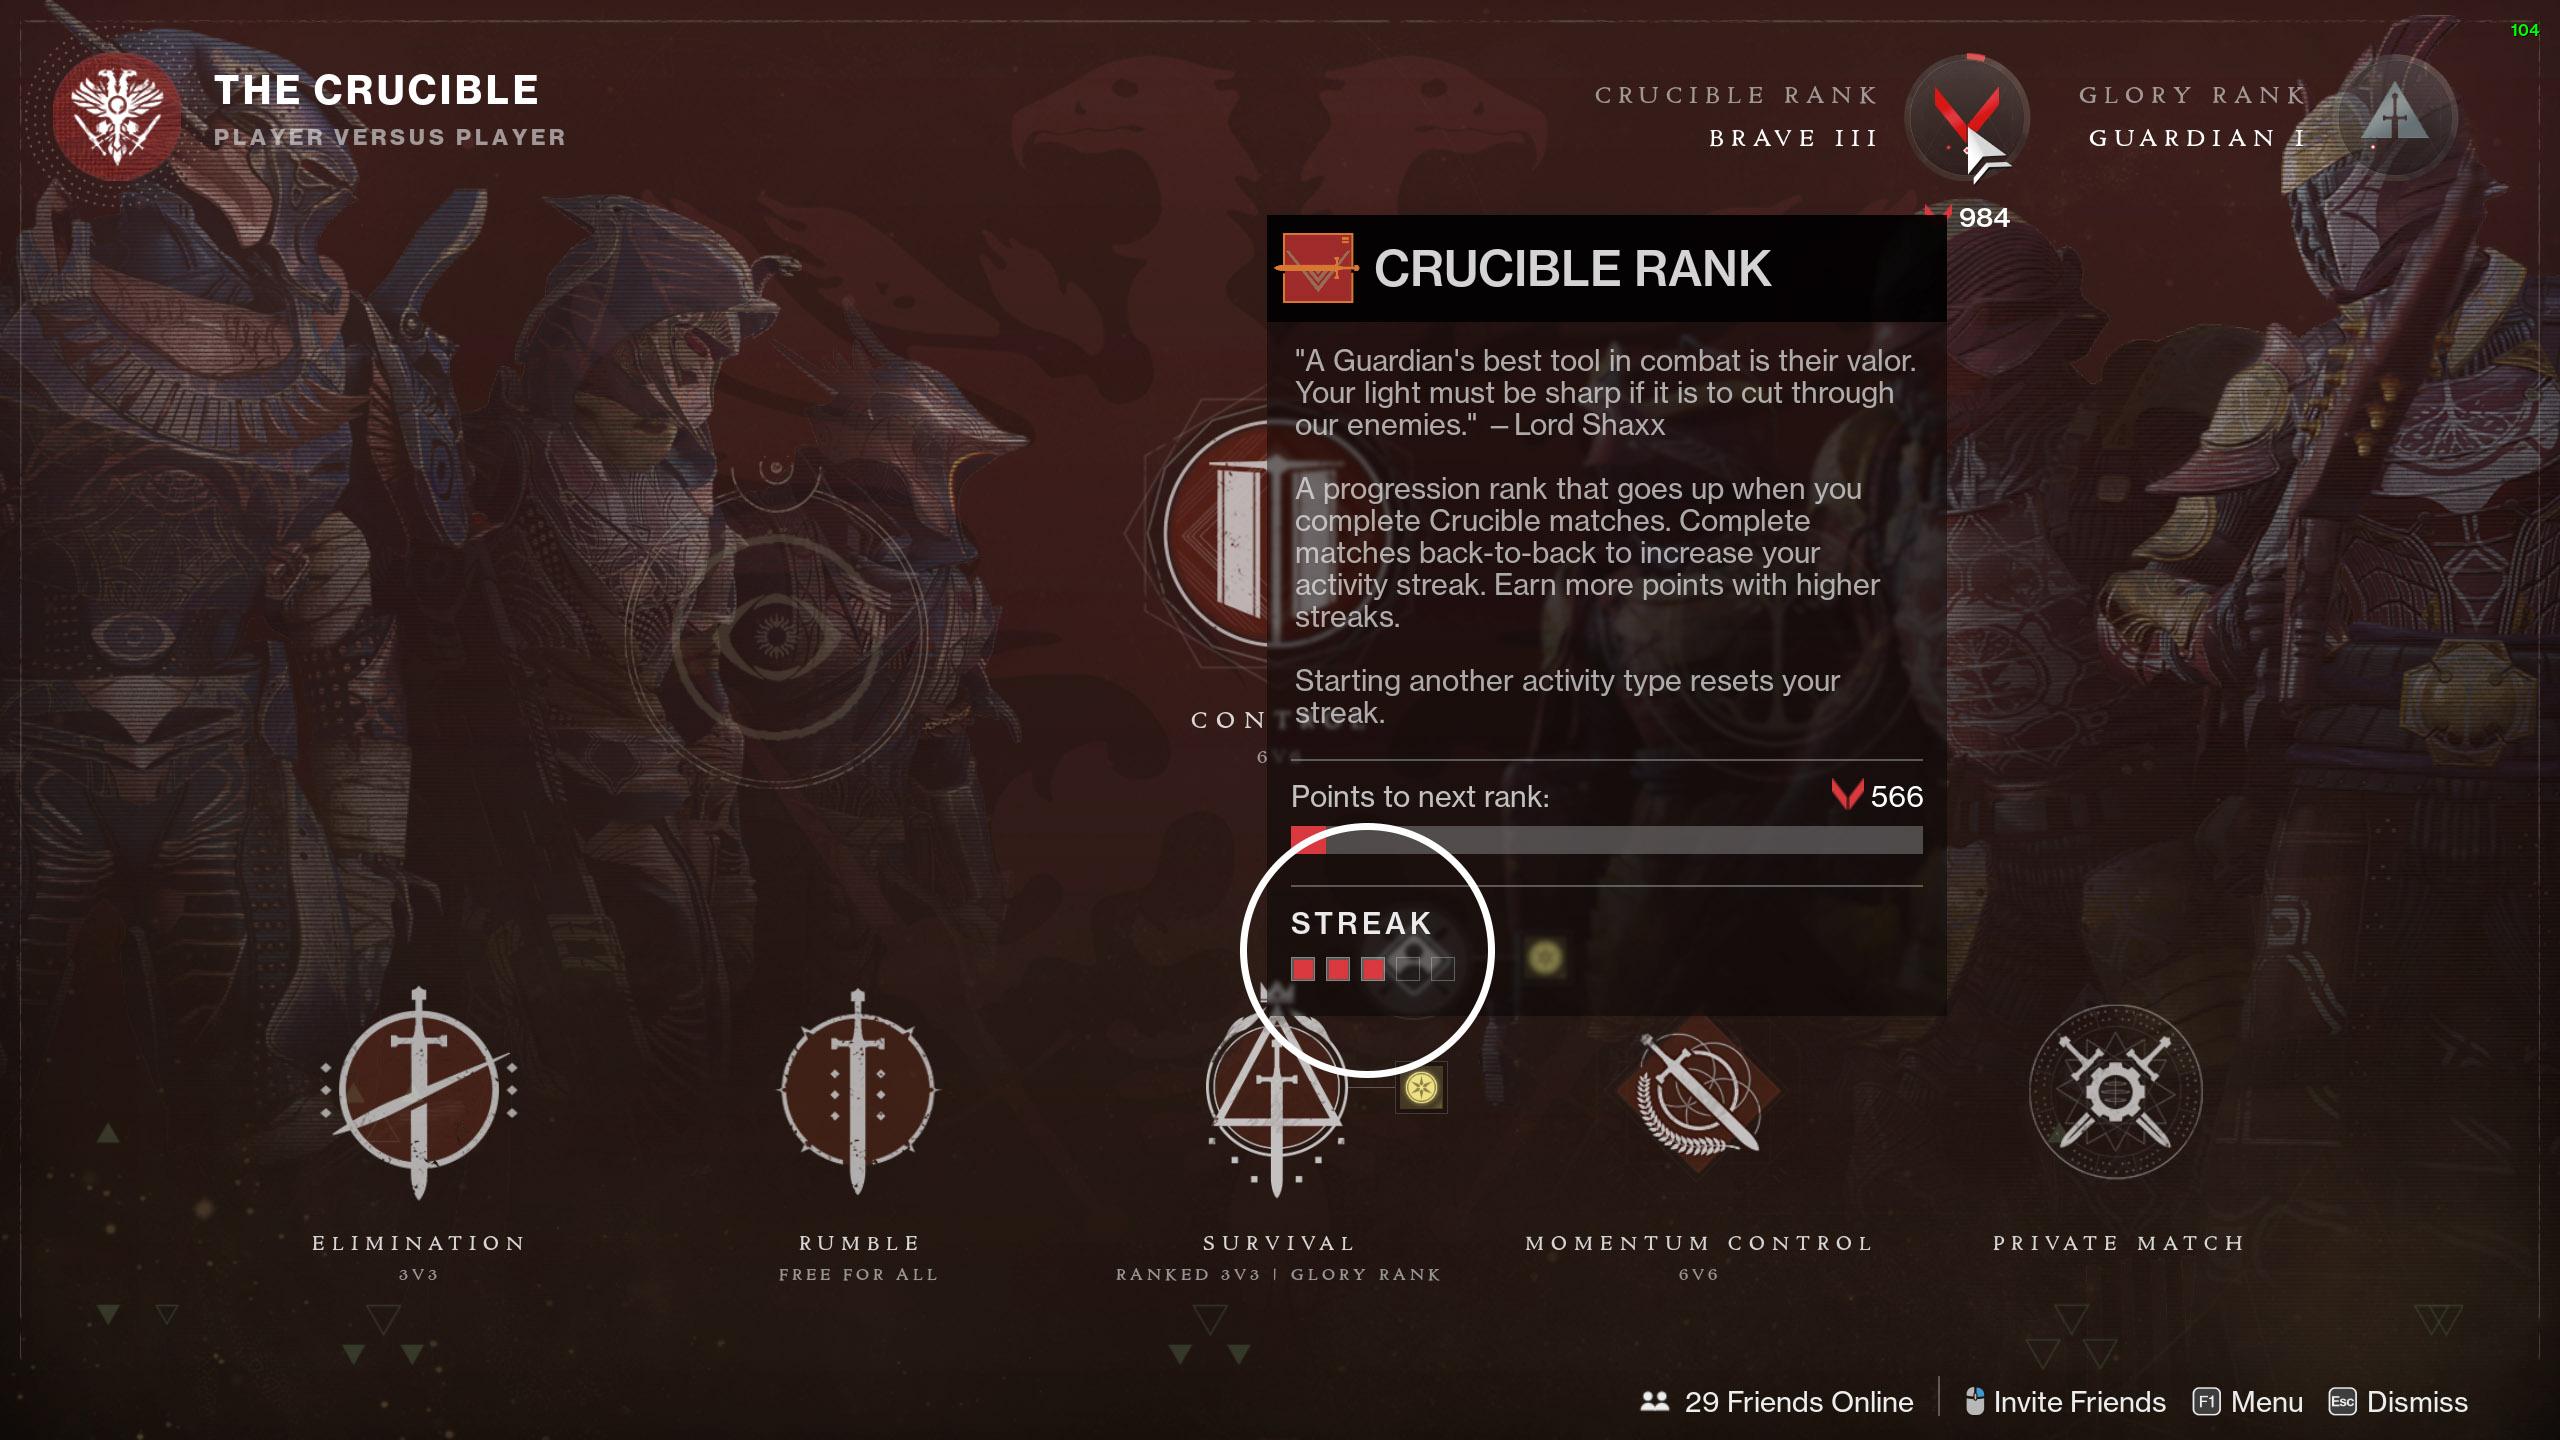 destiny 2 crucible ranks streaks